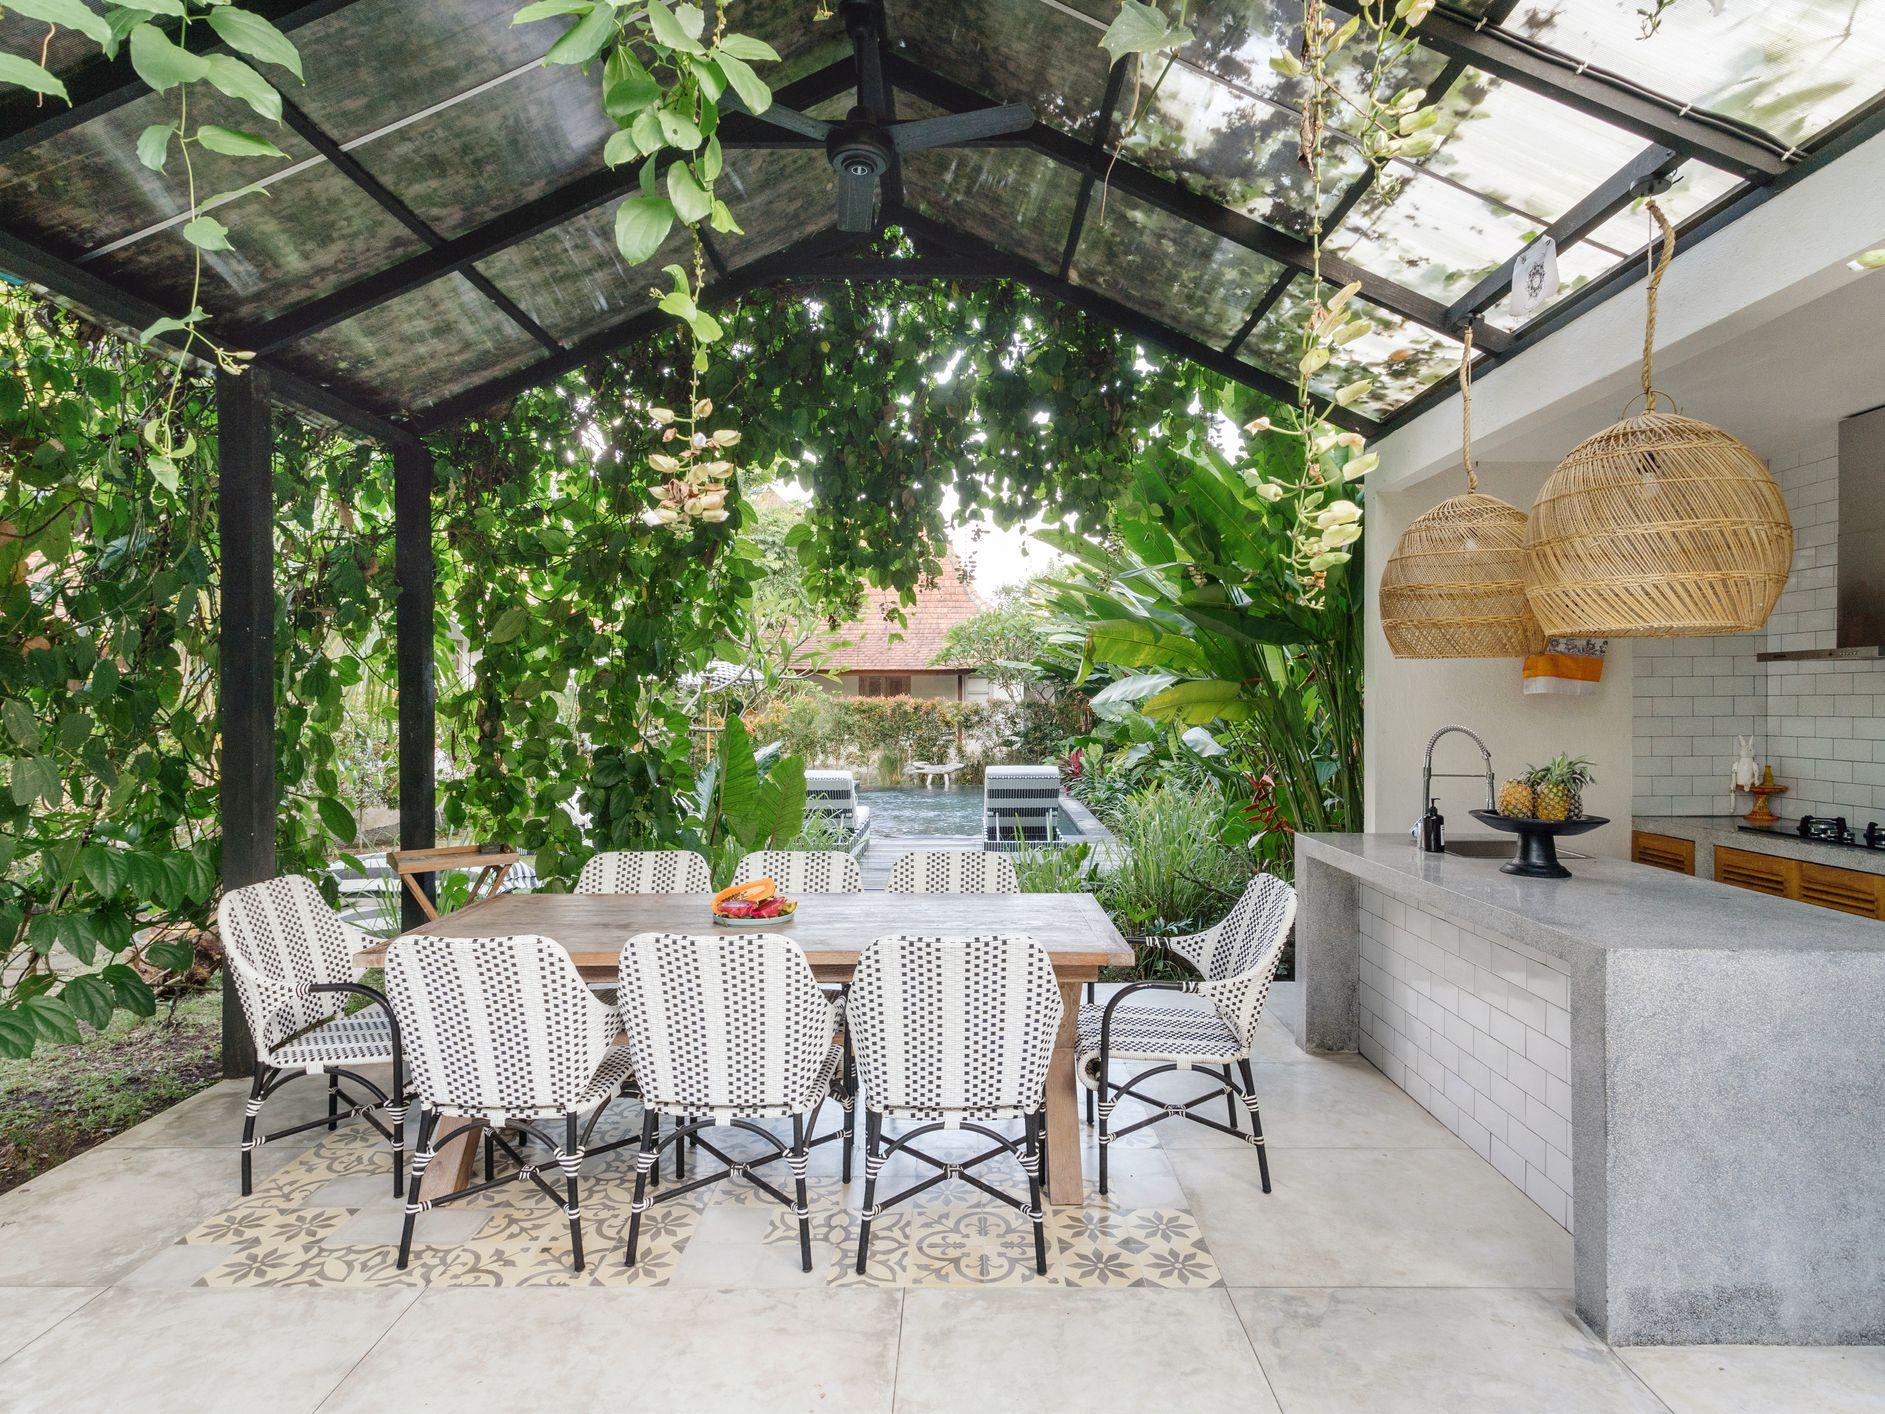 10 Fabulous Outdoor Dining Ideas